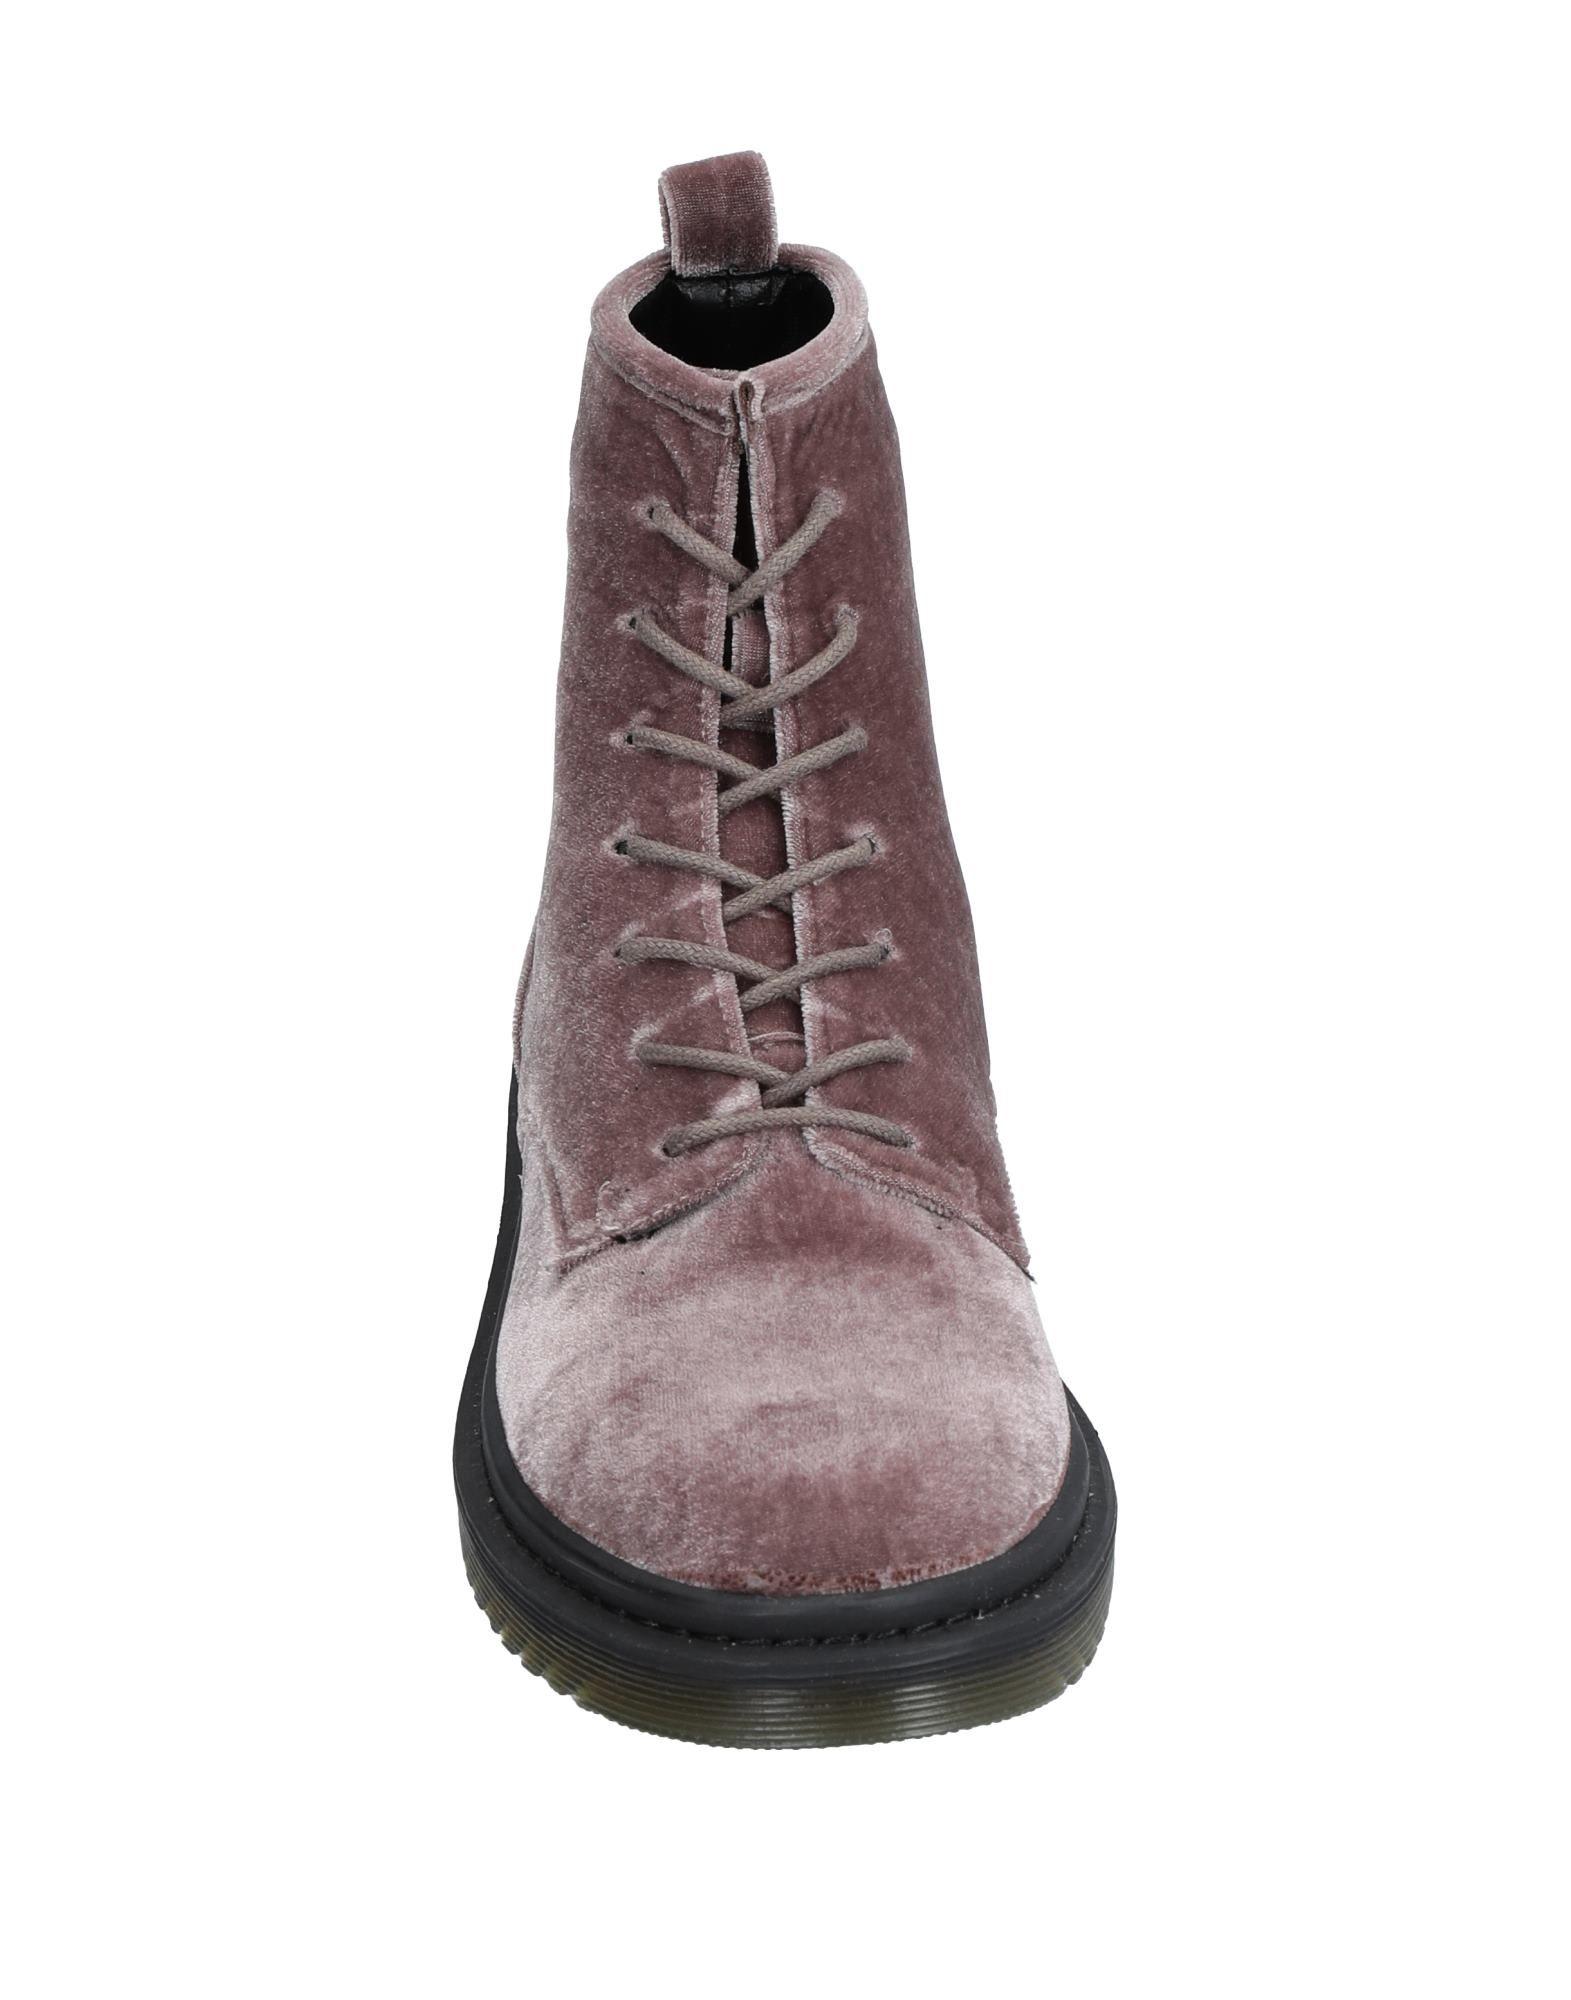 Alma Qualität En Pena. Stiefelette Damen  11525494QL Gute Qualität Alma beliebte Schuhe 7231d5